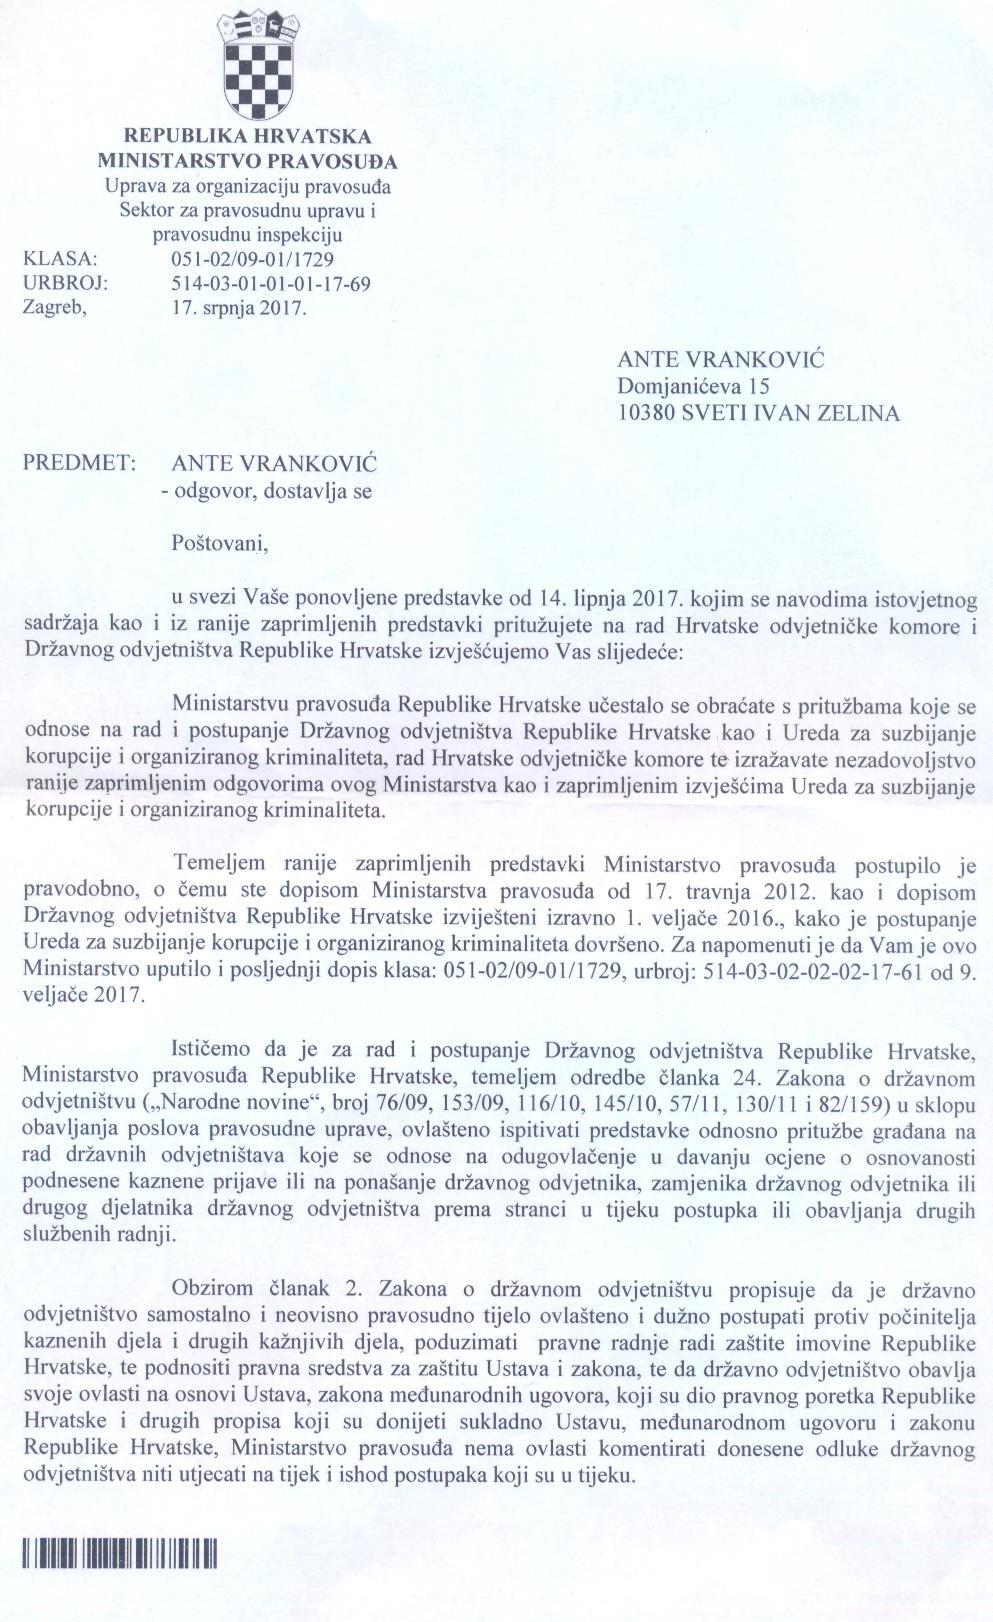 Vranković - Prilog 1